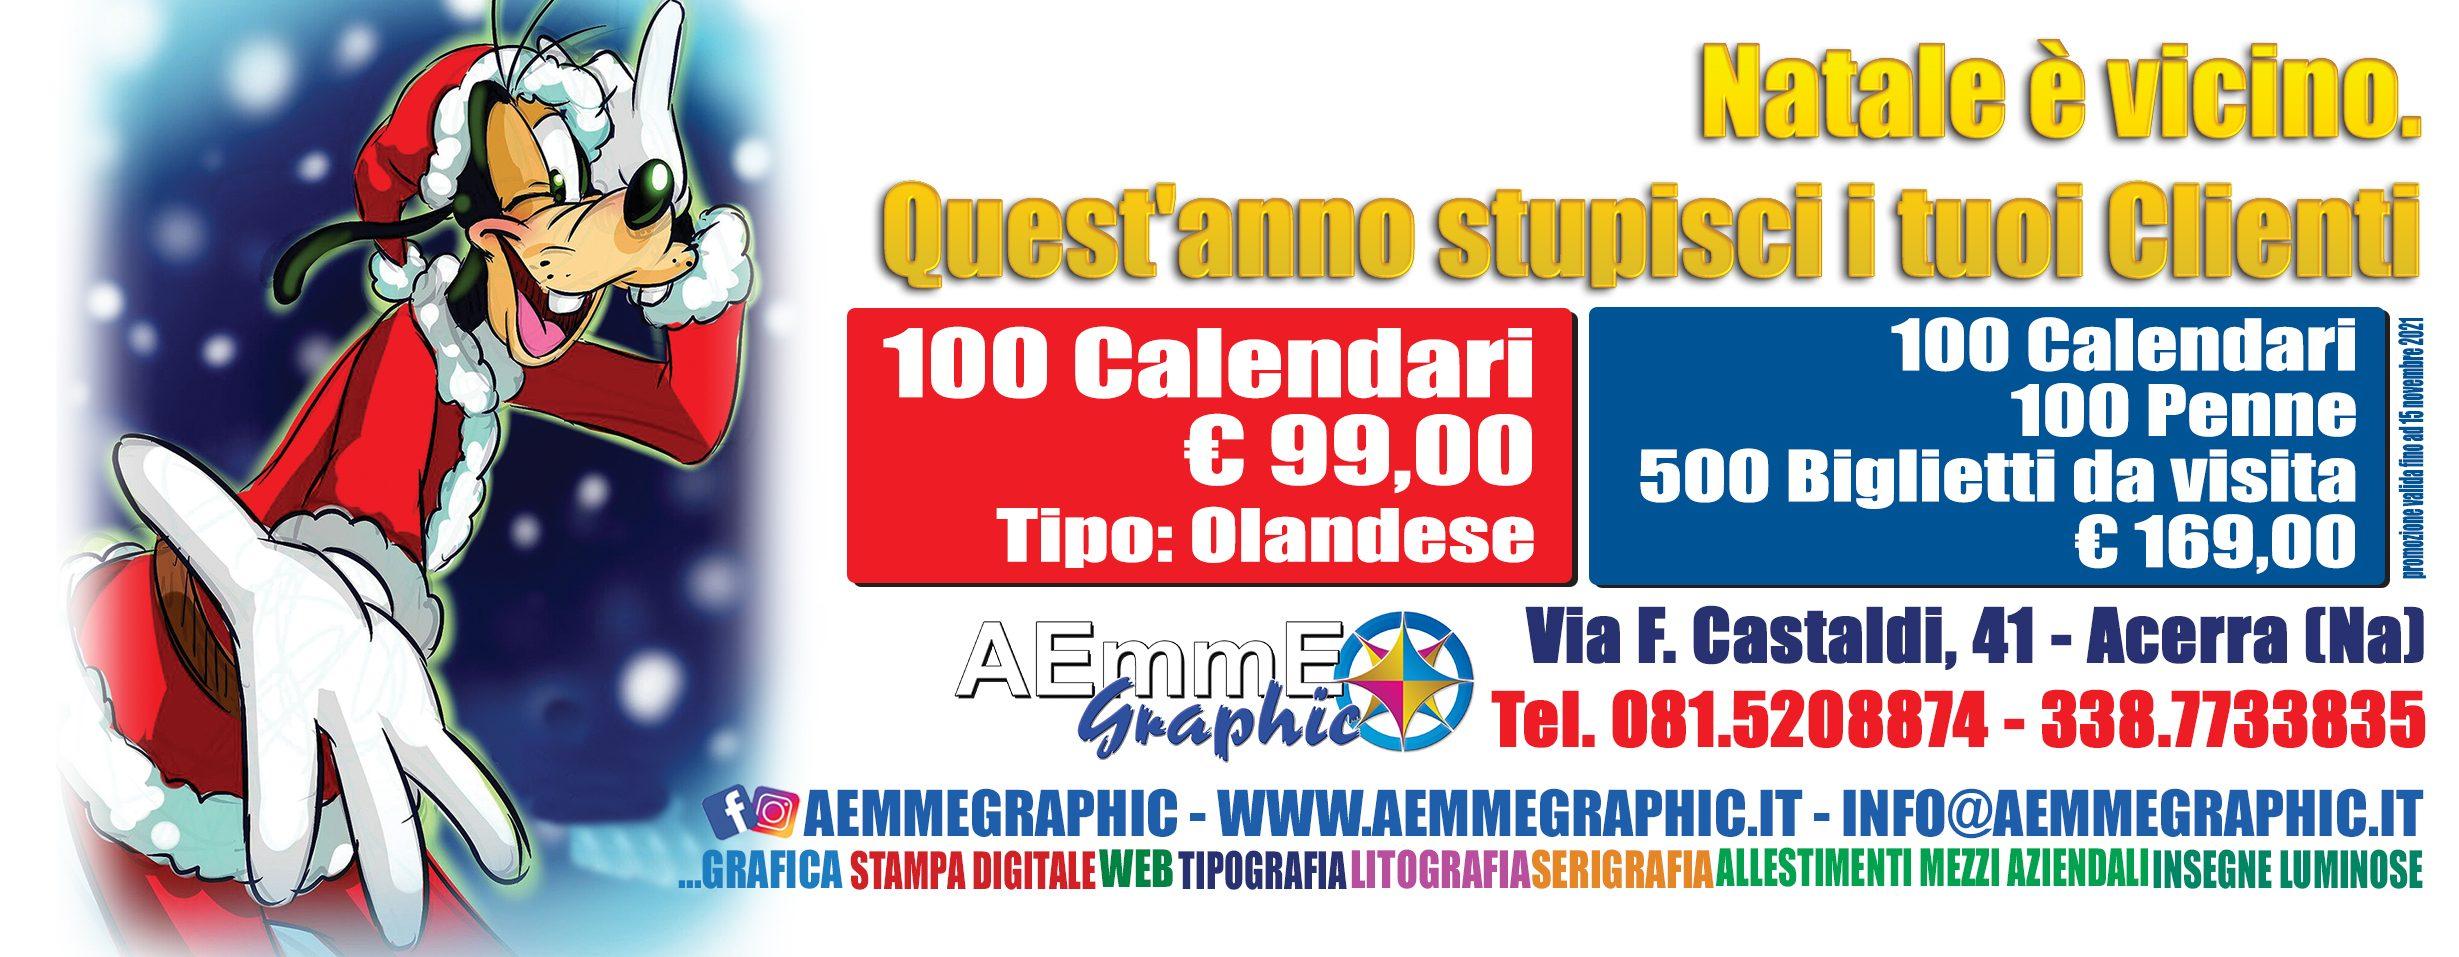 www.aemmegraphic.it